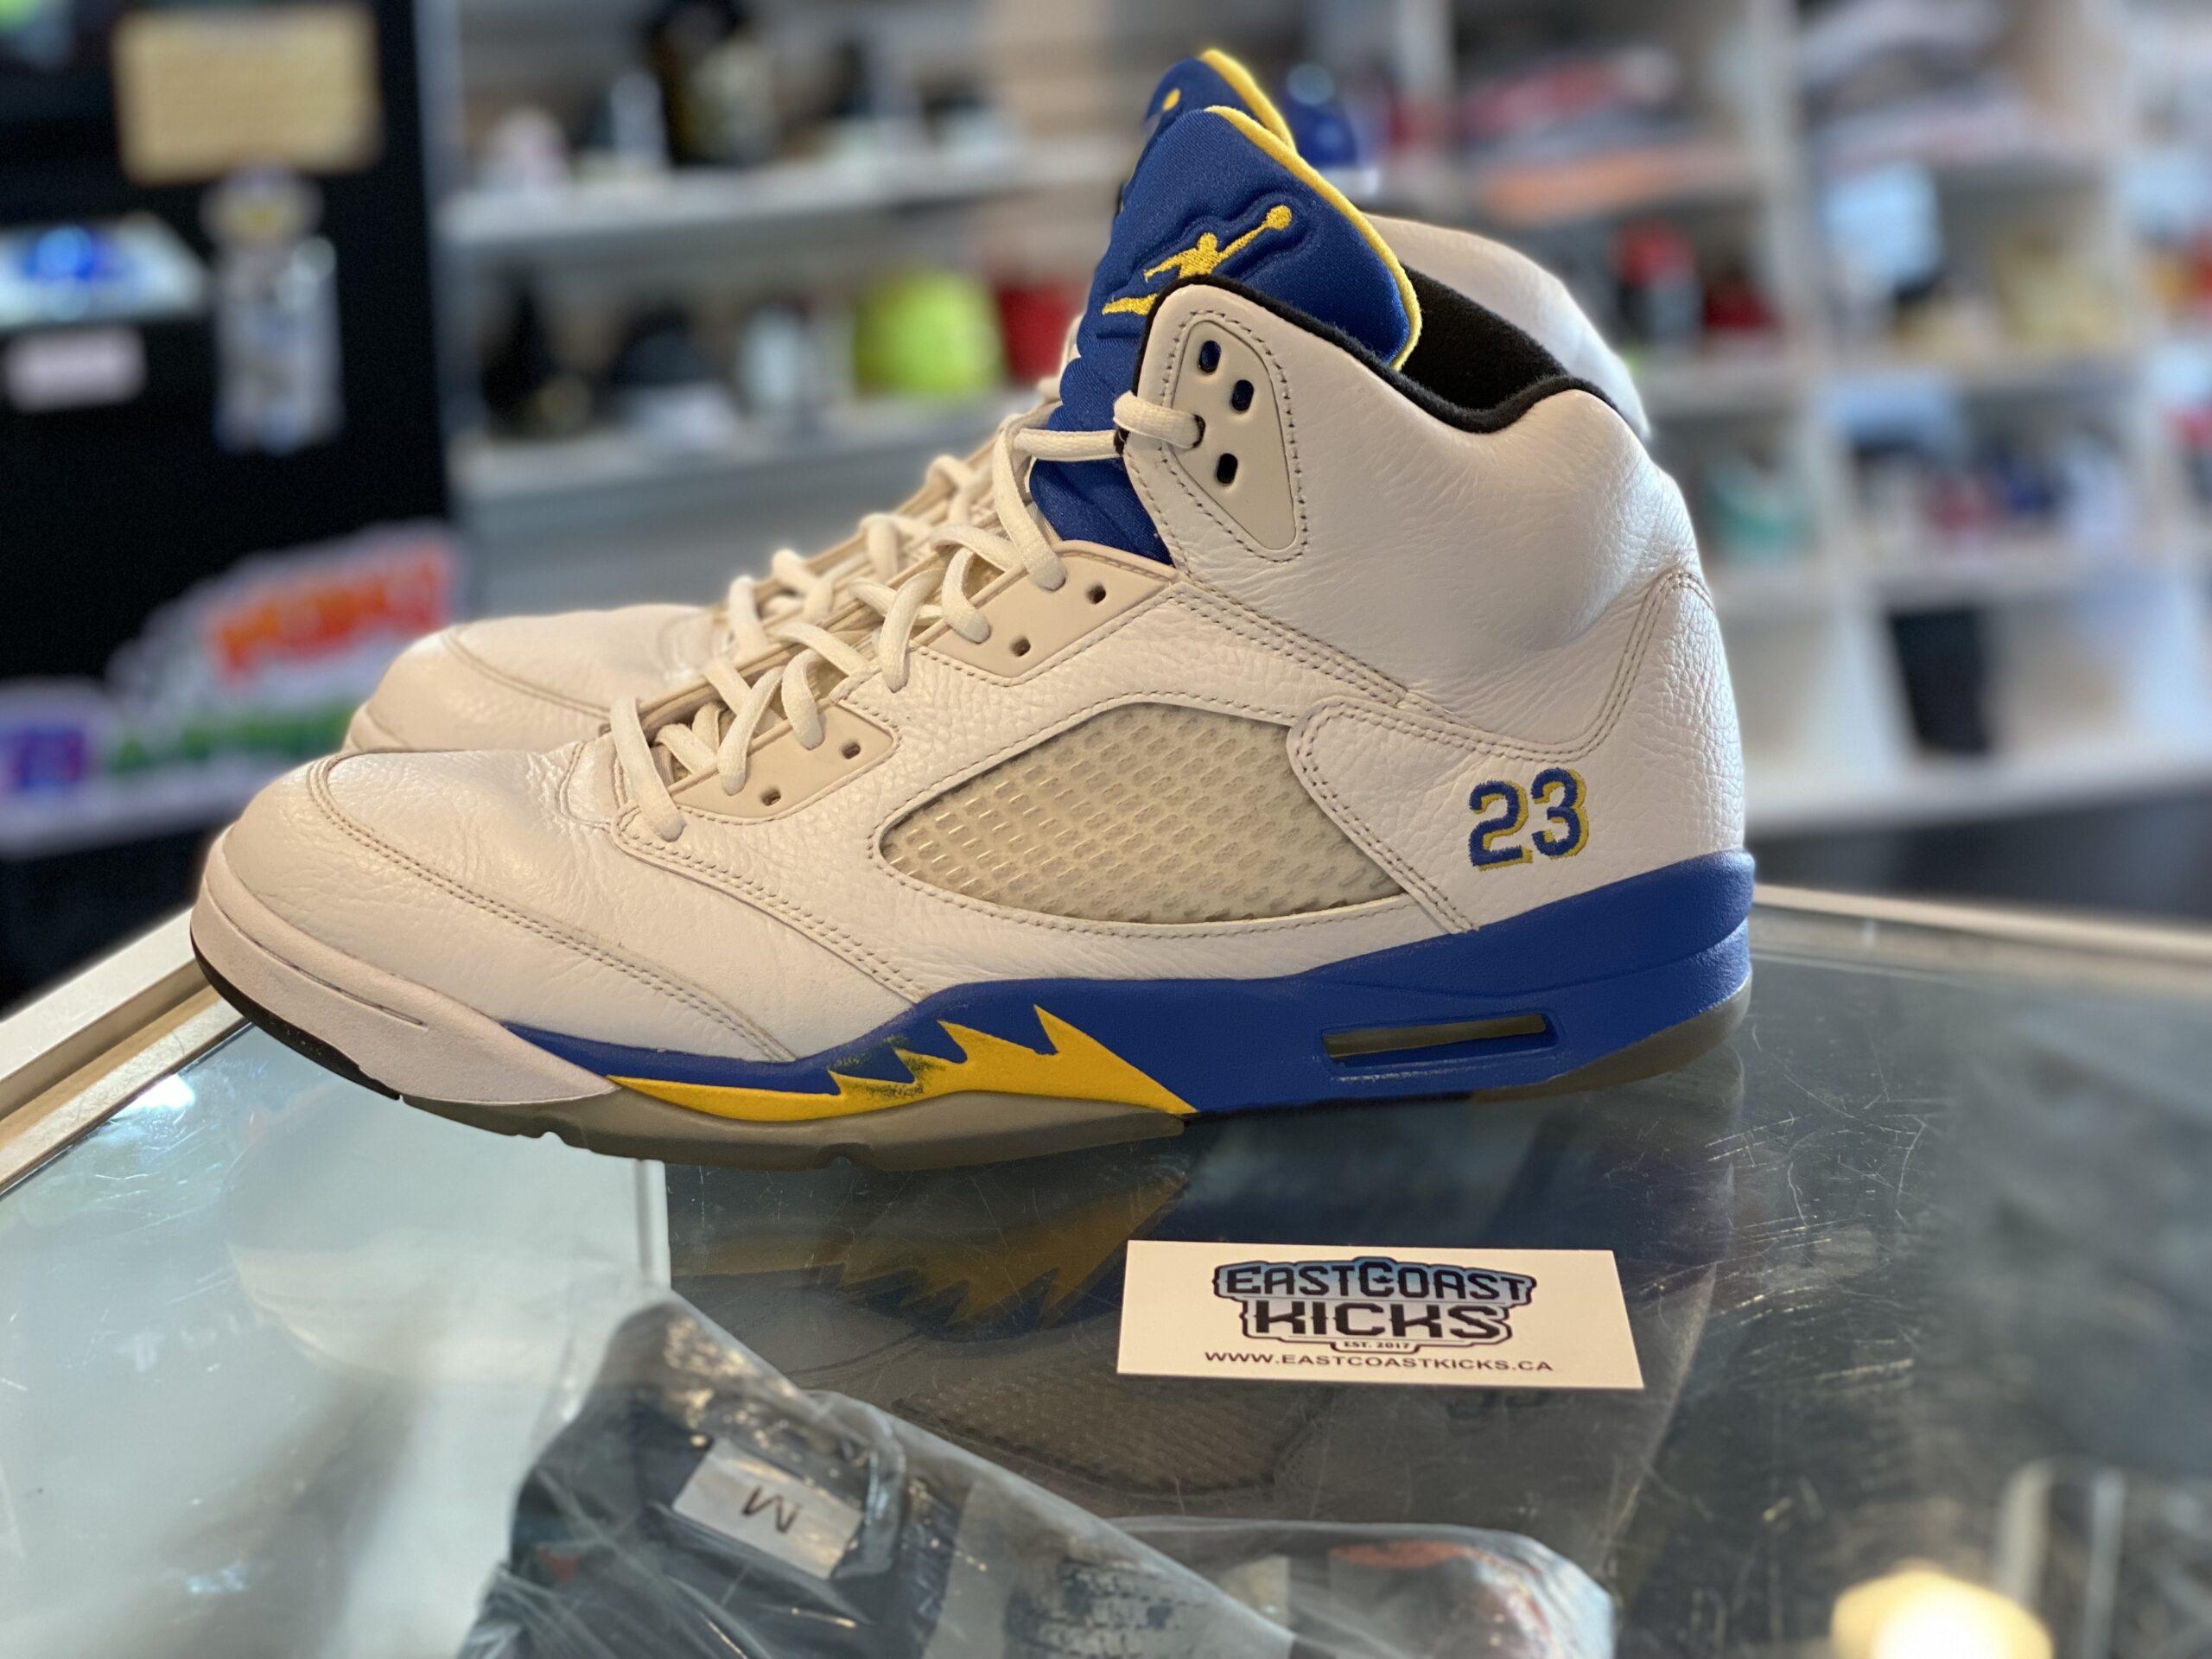 Preowned Jordan 5 Laney Size 13